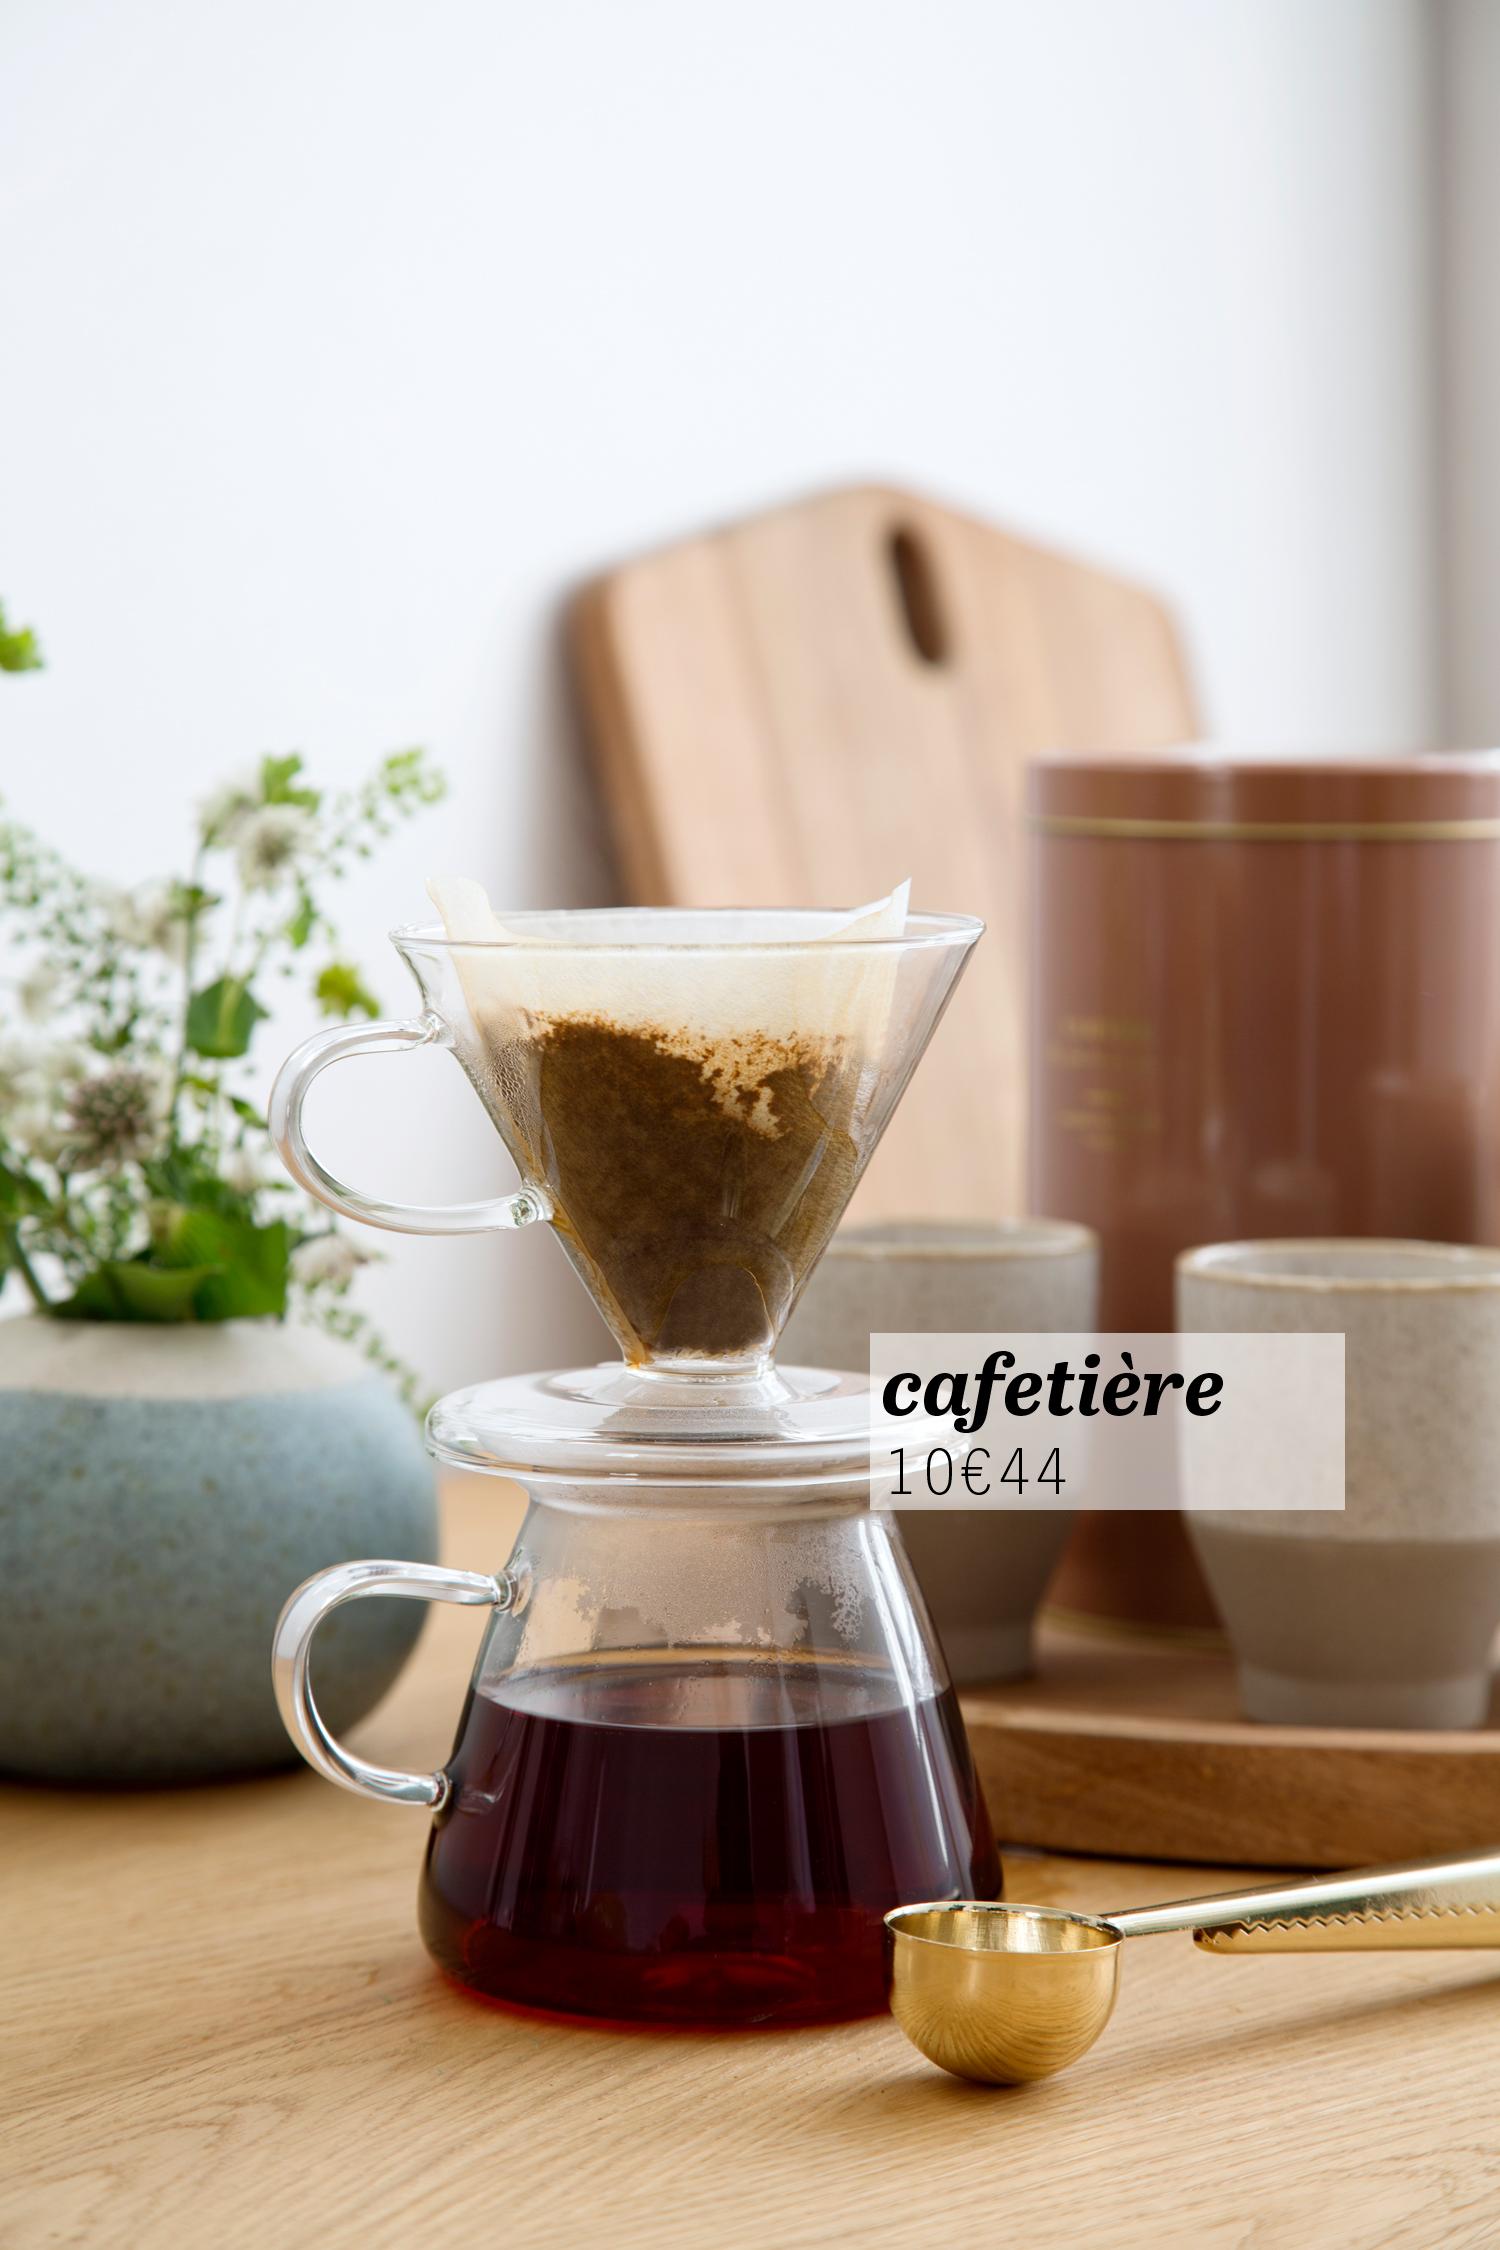 cafetière-sostrene-grene